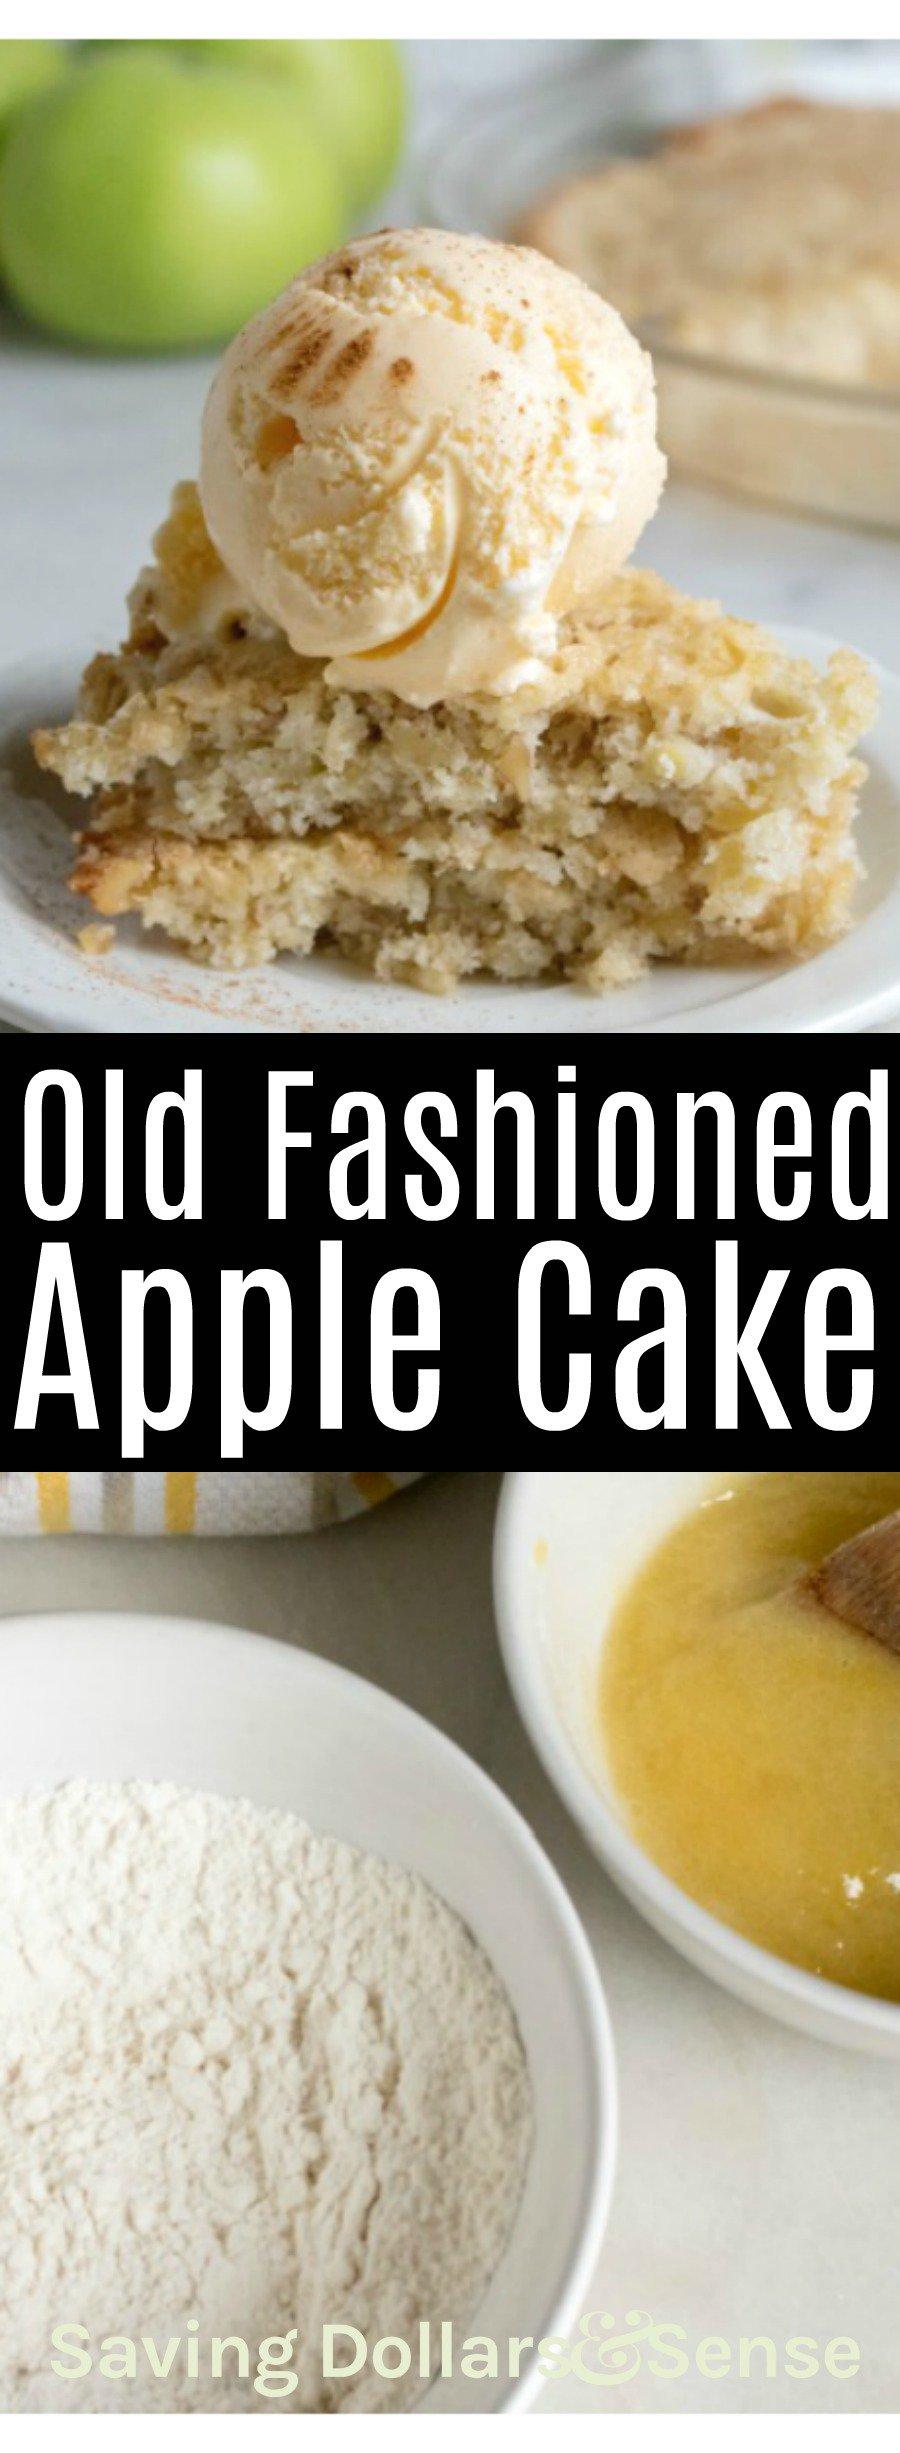 Old fashioned apple dump cake.